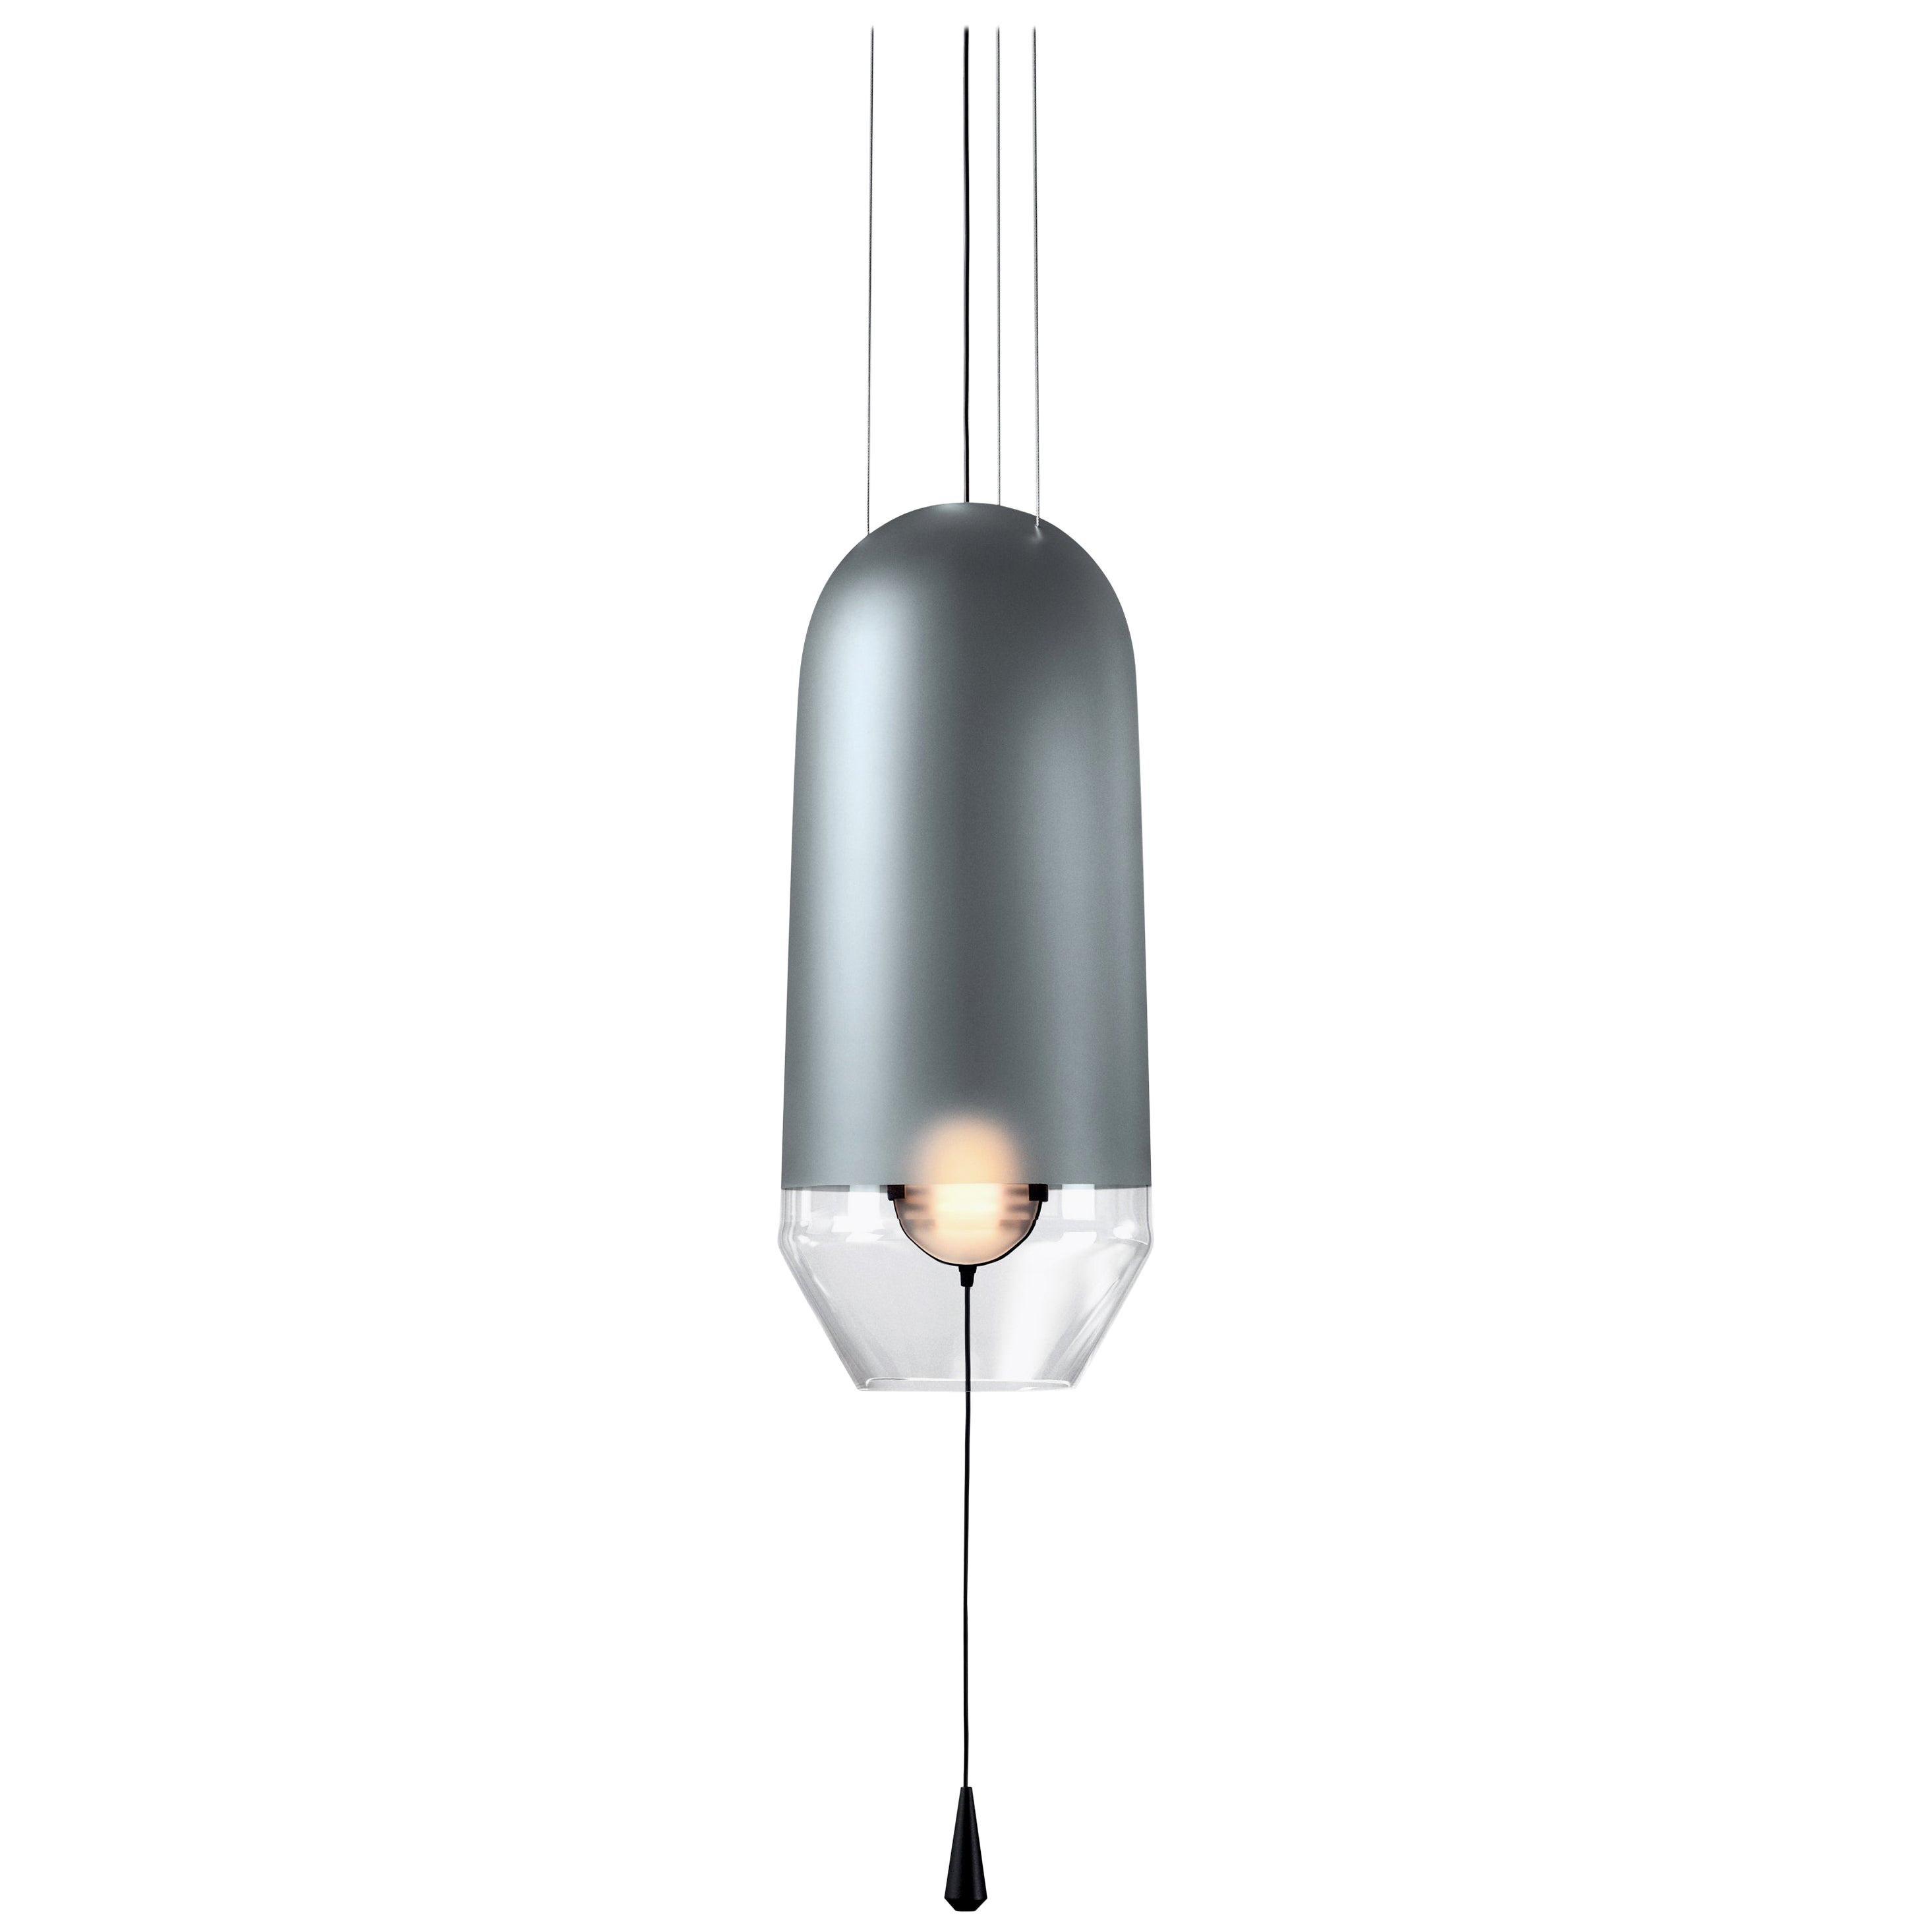 Limpid Light S Graphite Full-Swing, Decorative Light, Hand Blown Glass, Europe